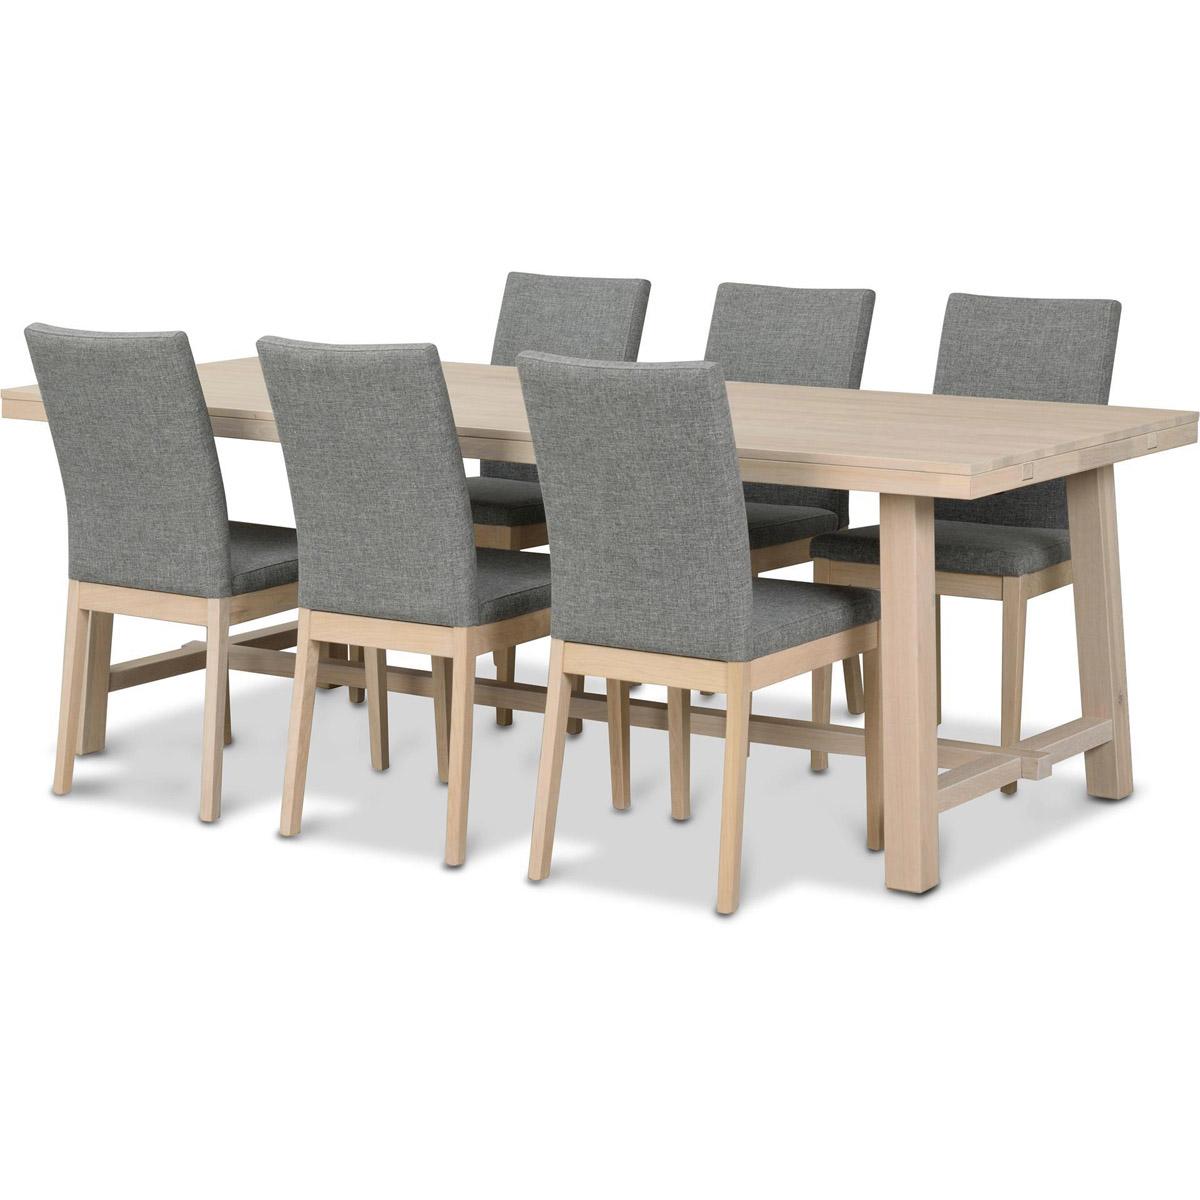 George bord vitpigmenterad med 6 stolar Kavaljer ek vitpgmenterad/grått tyg vinkel